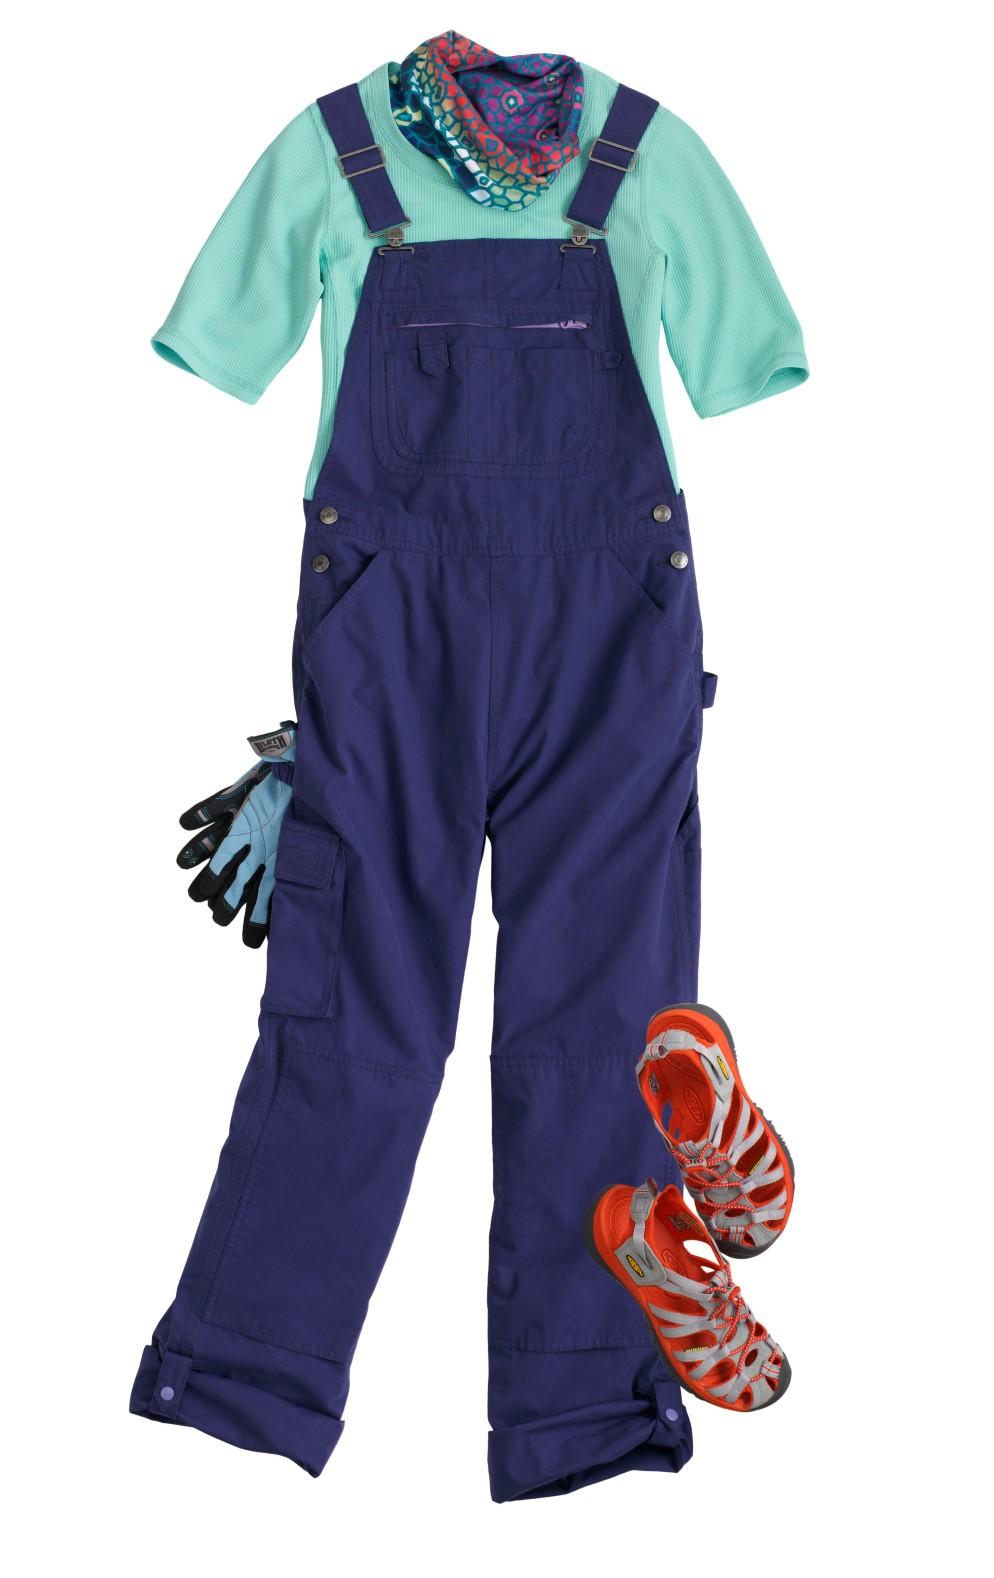 Gardening Clothes: Heirloom Garden Overalls #56955 - No Sweat Waffle Longtail T Shirt #73526